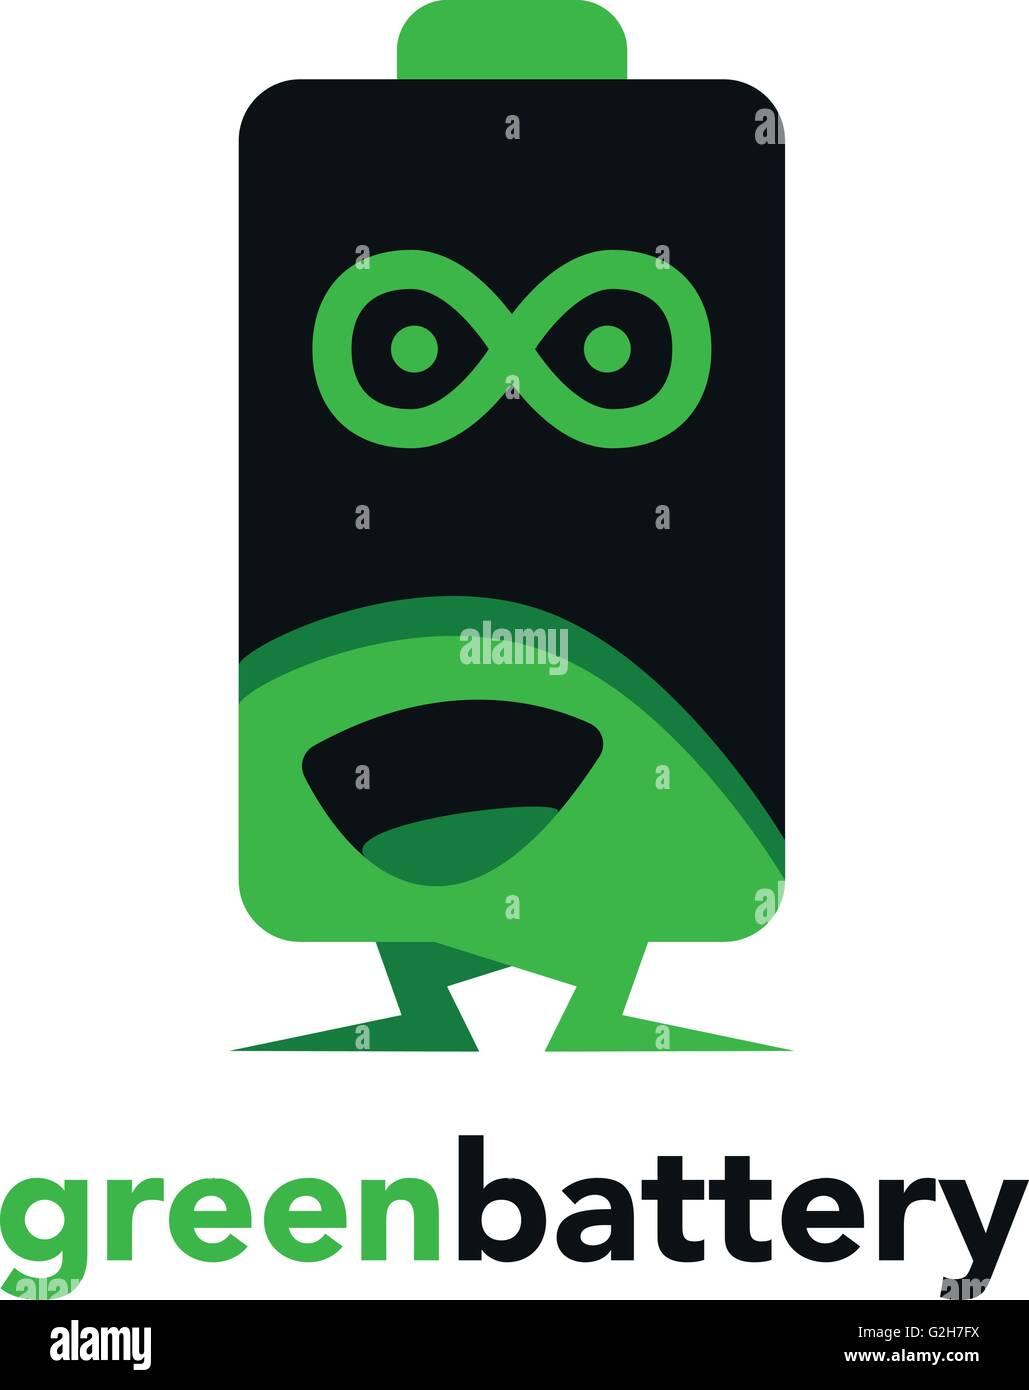 Battery Logo Imágenes De Stock & Battery Logo Fotos De Stock - Alamy